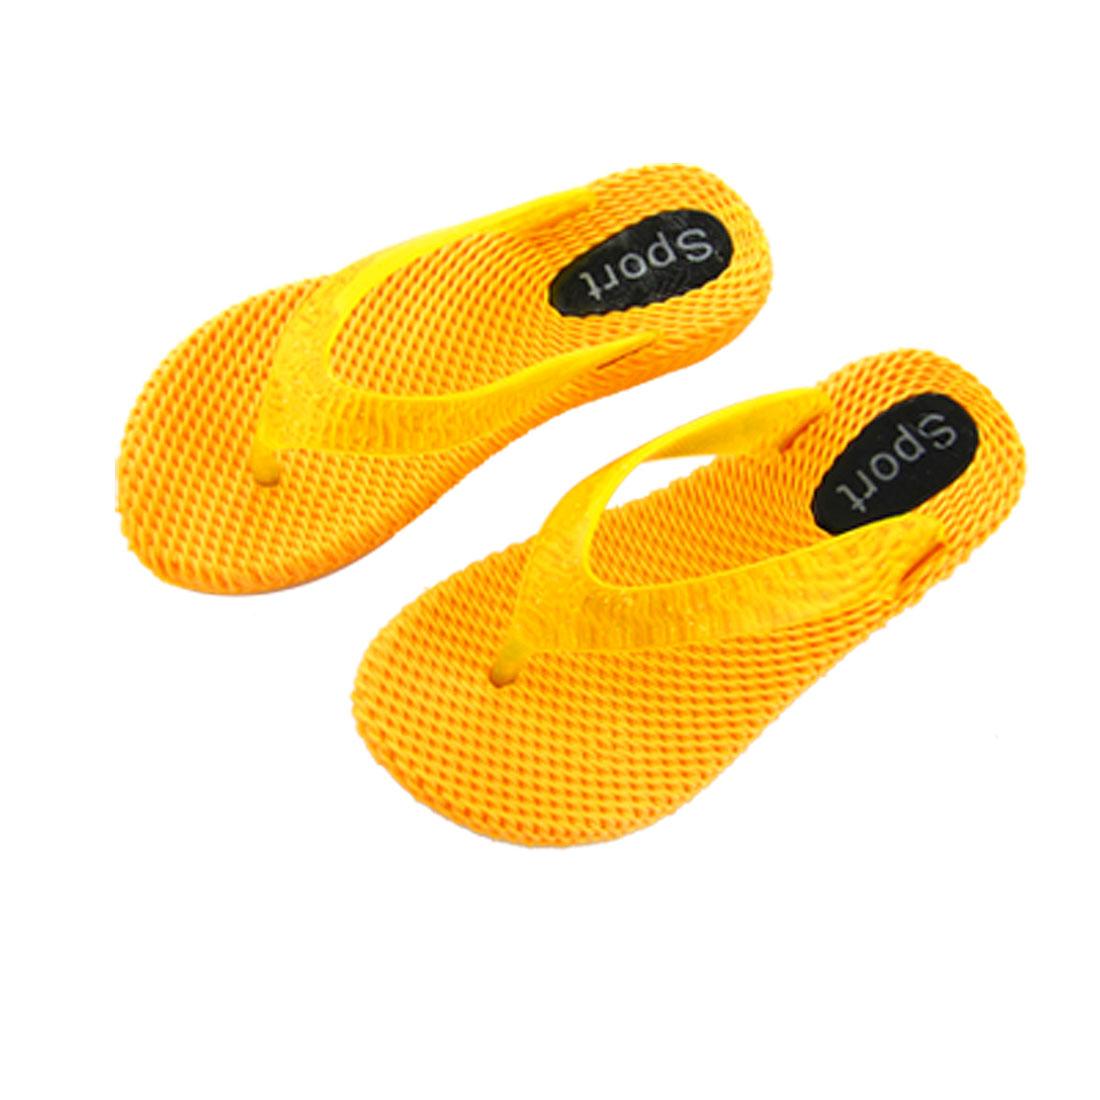 Yellow Summer Beach Slippers Pool Thongs Flip Flops for Girls